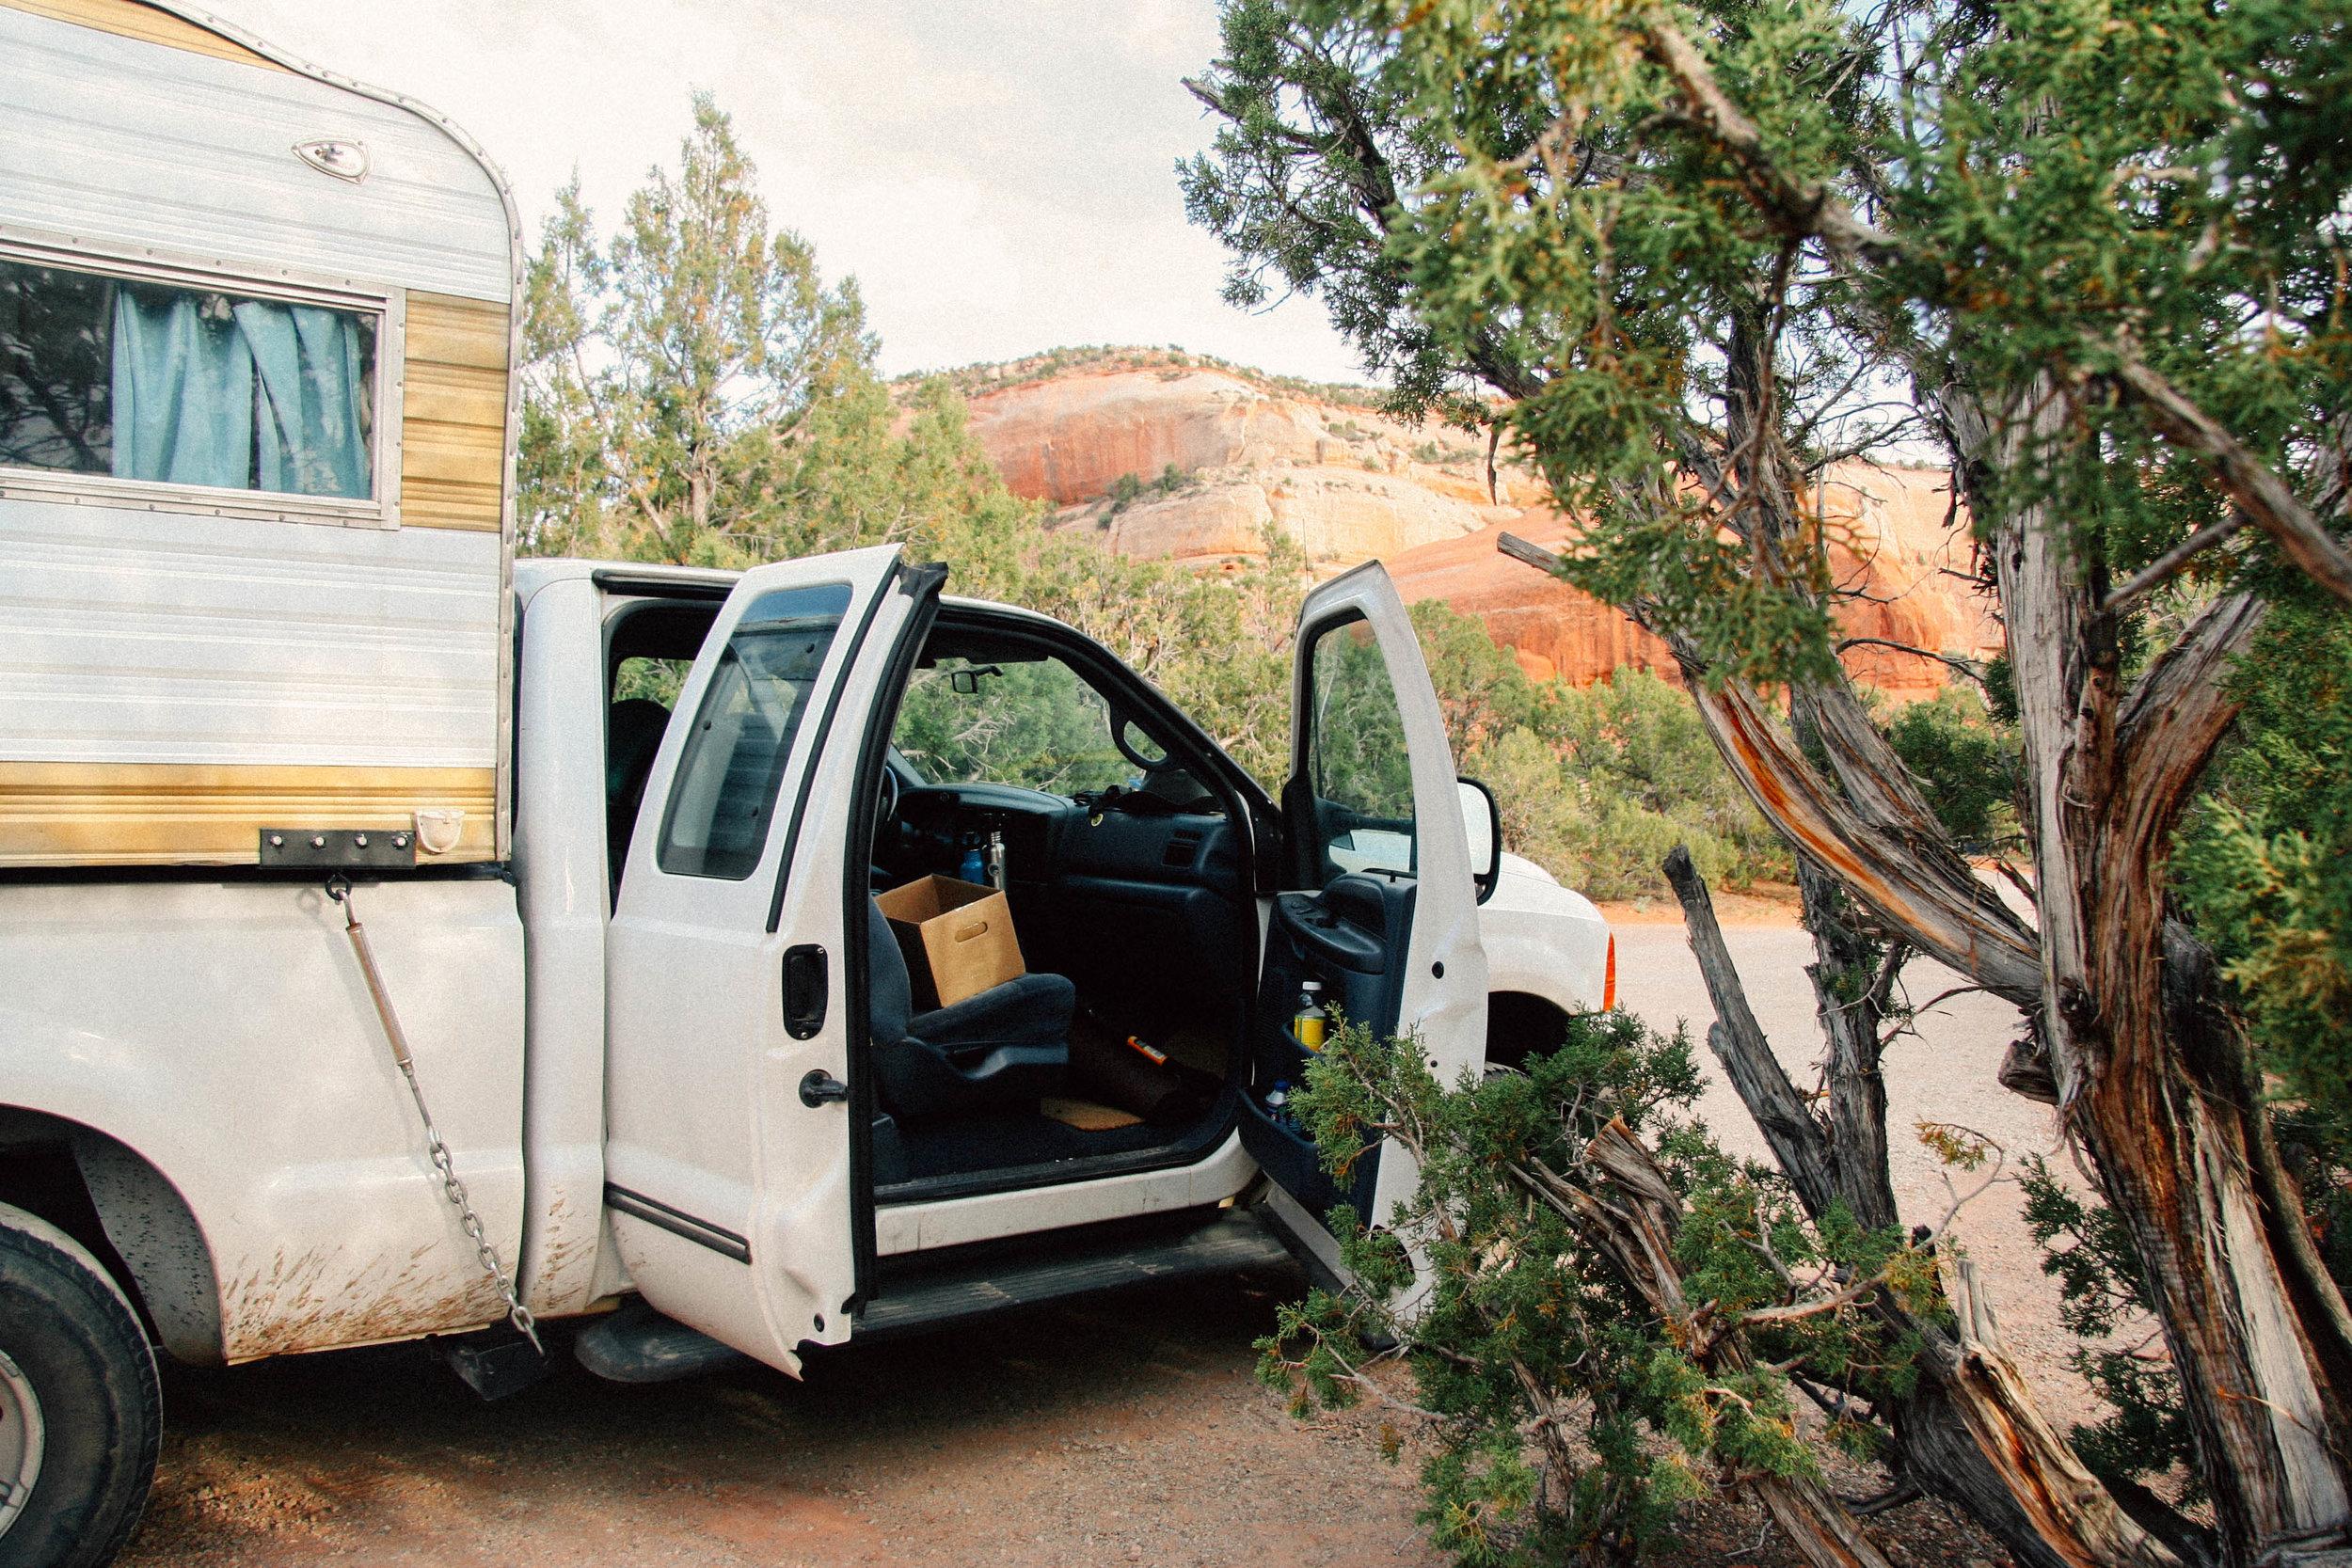 The camper truck/home camped by Utah Juniper,  Juniperus osteosperma ( Cupressaceae) and Two-needled Pinon Pine,  Pinus edulis  (Pinaceae) near Canyonlands National Part, Utah.